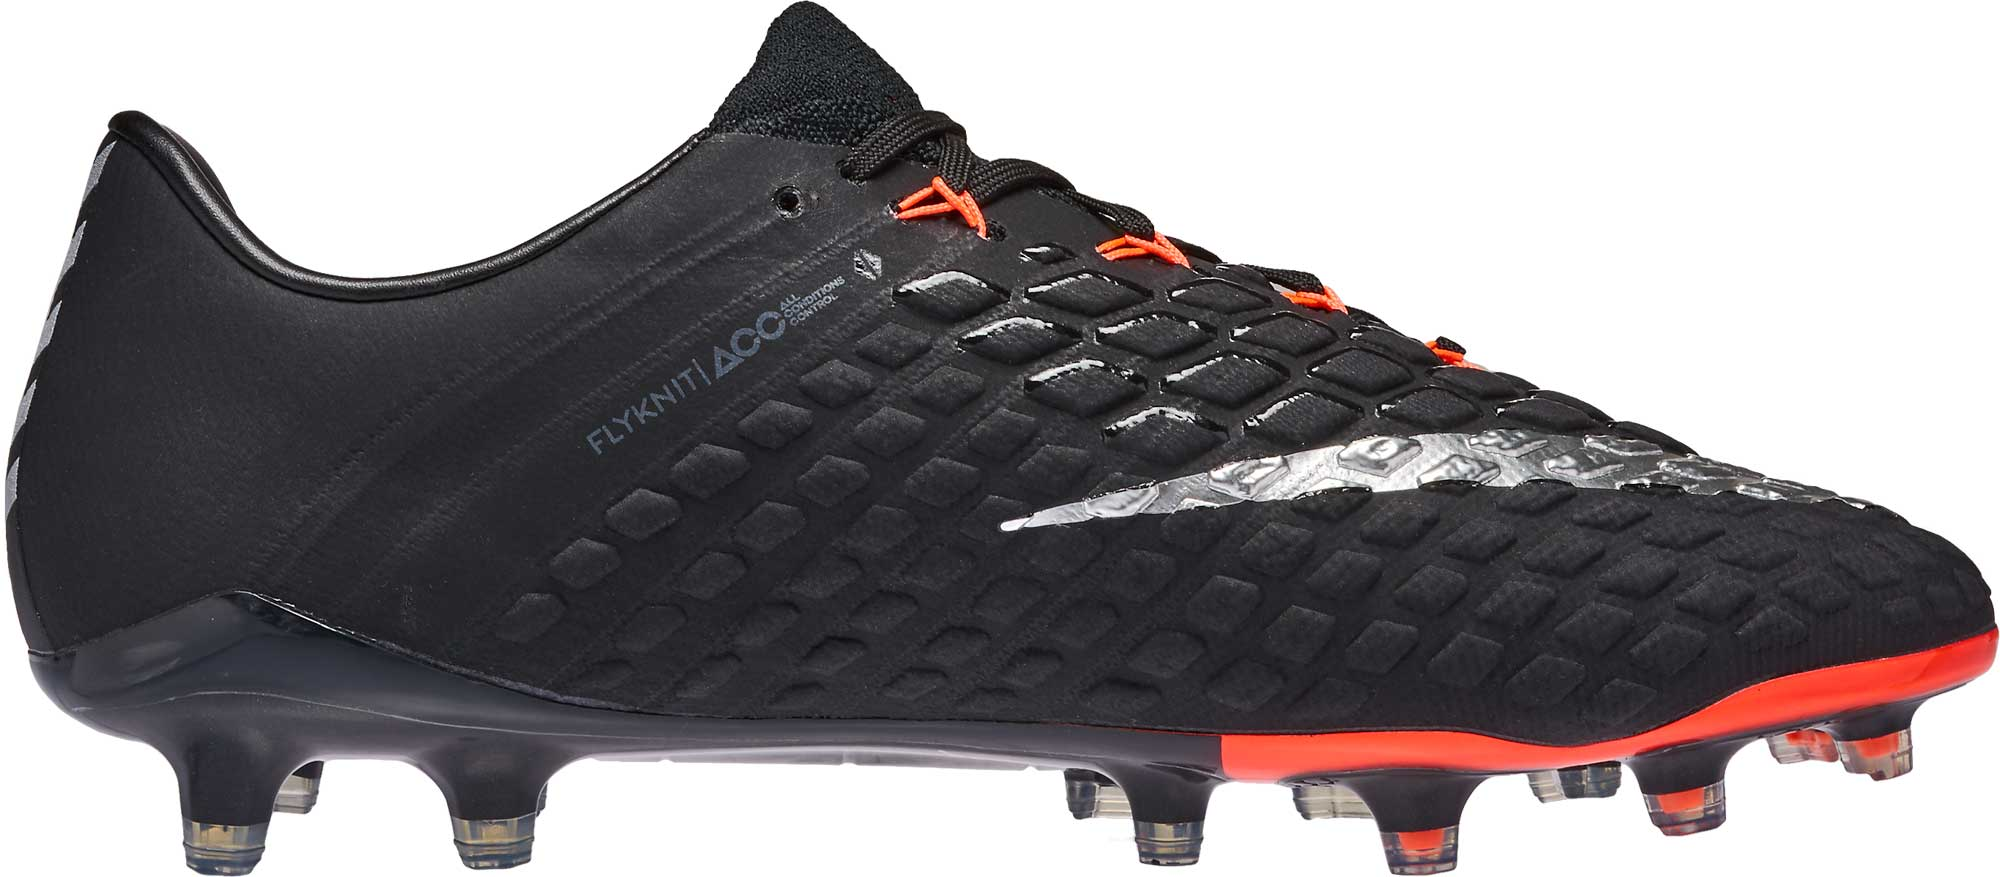 0148f500c Nike Hypervenom Phantom III FG - Black Phantom Cleats